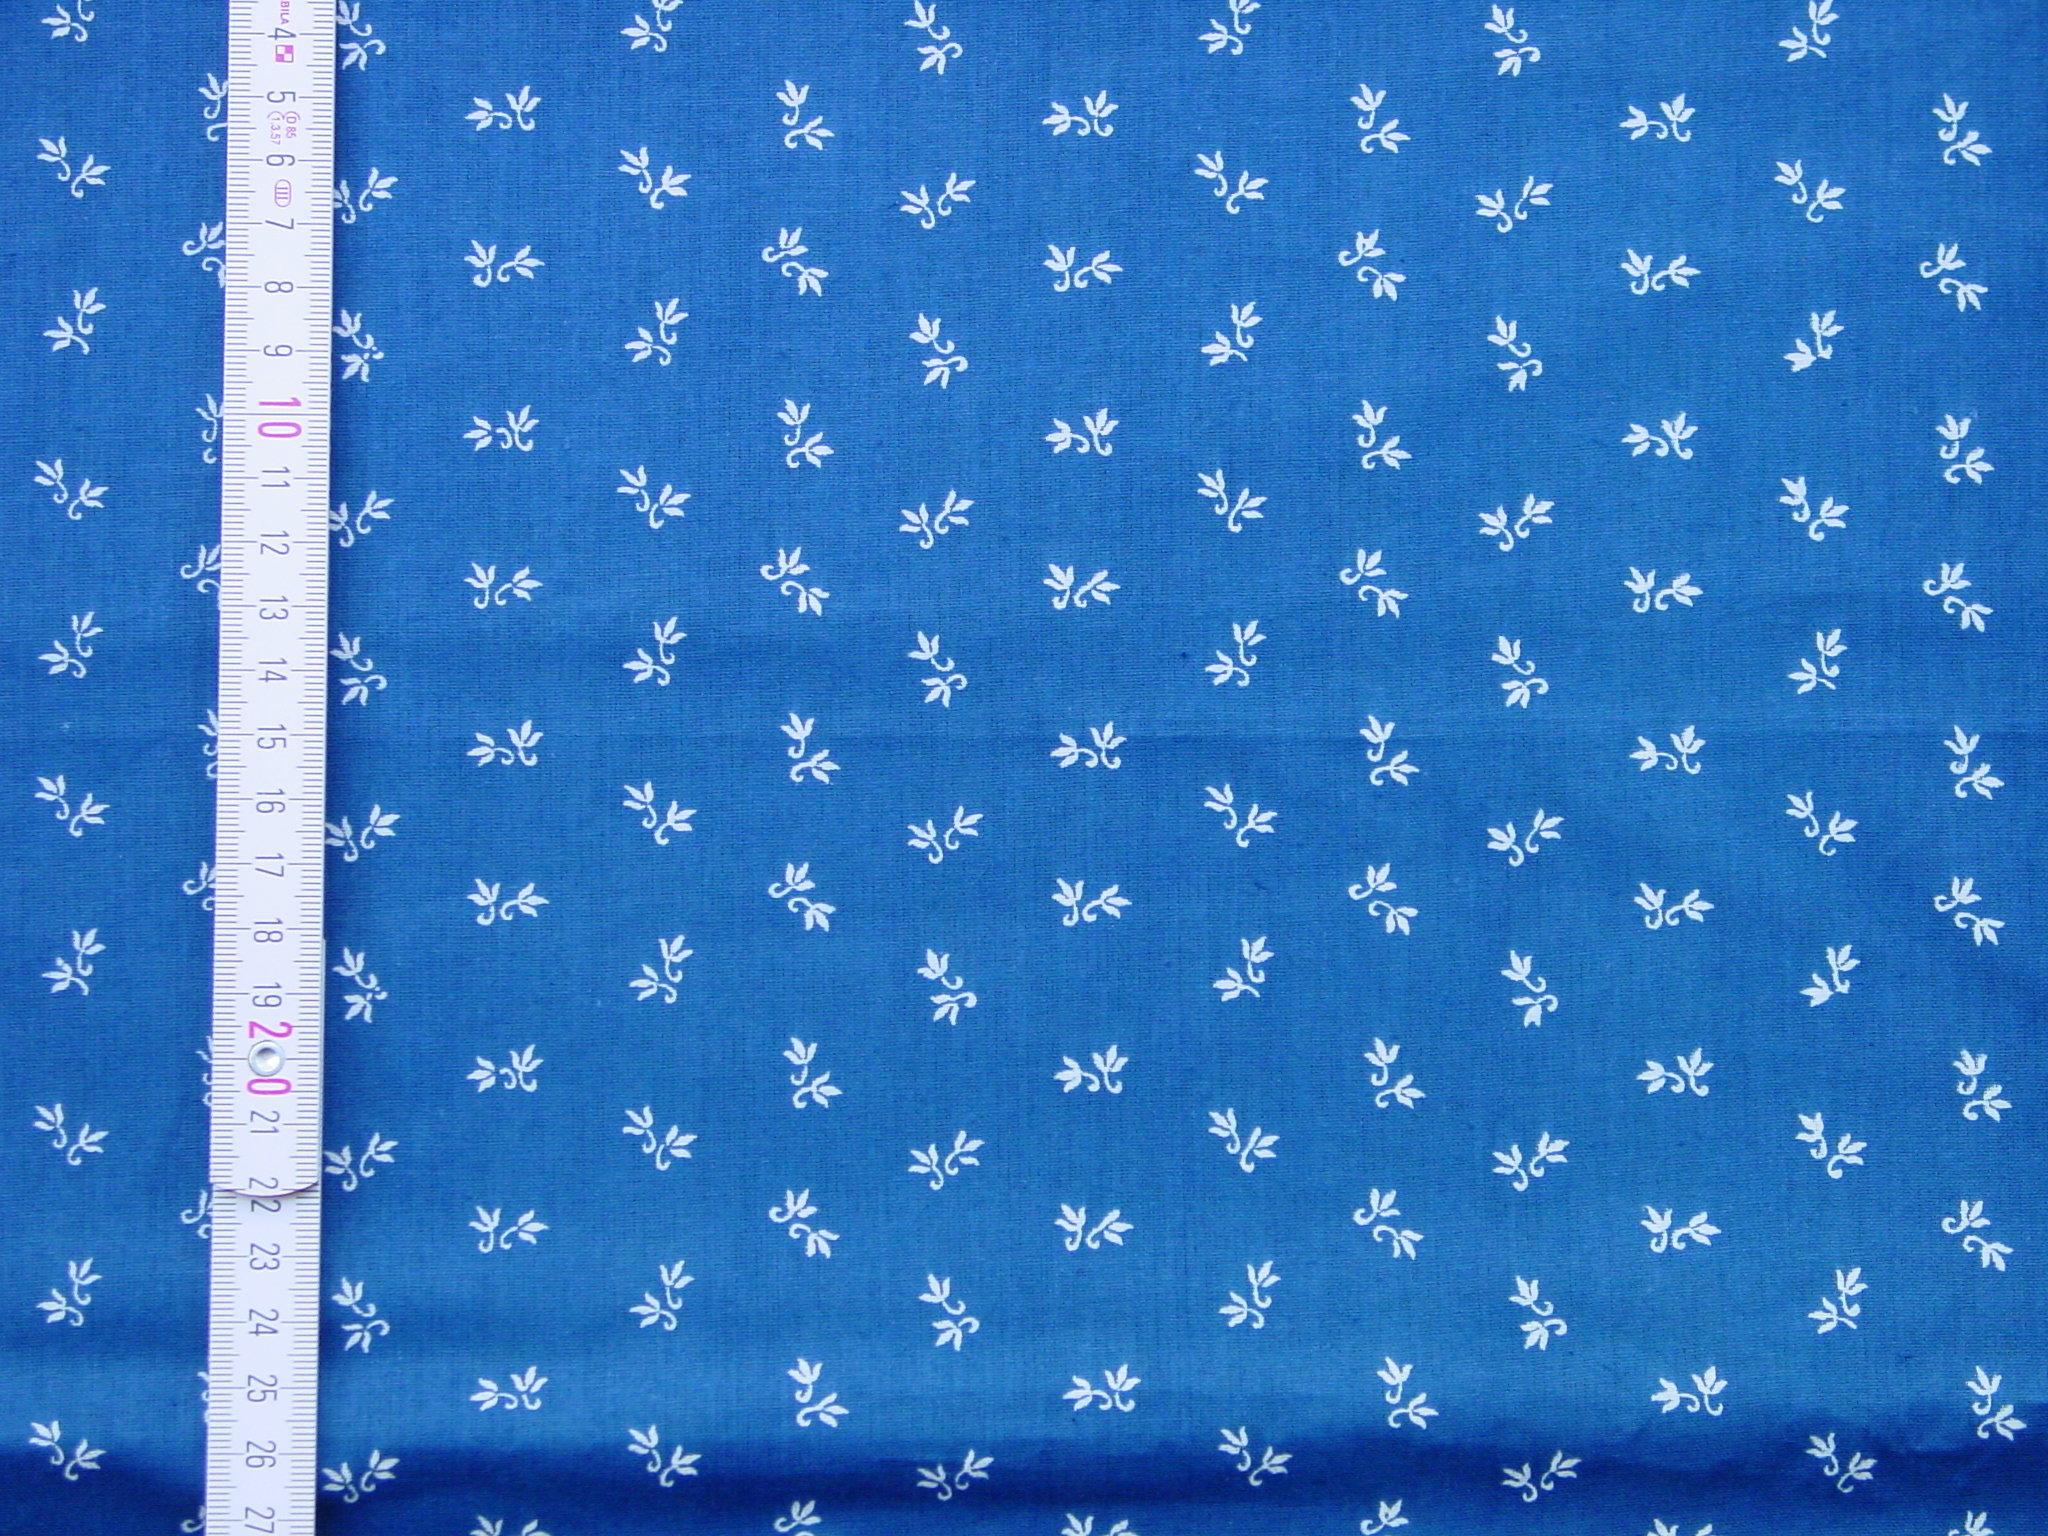 Blaudruckstoff 036-0